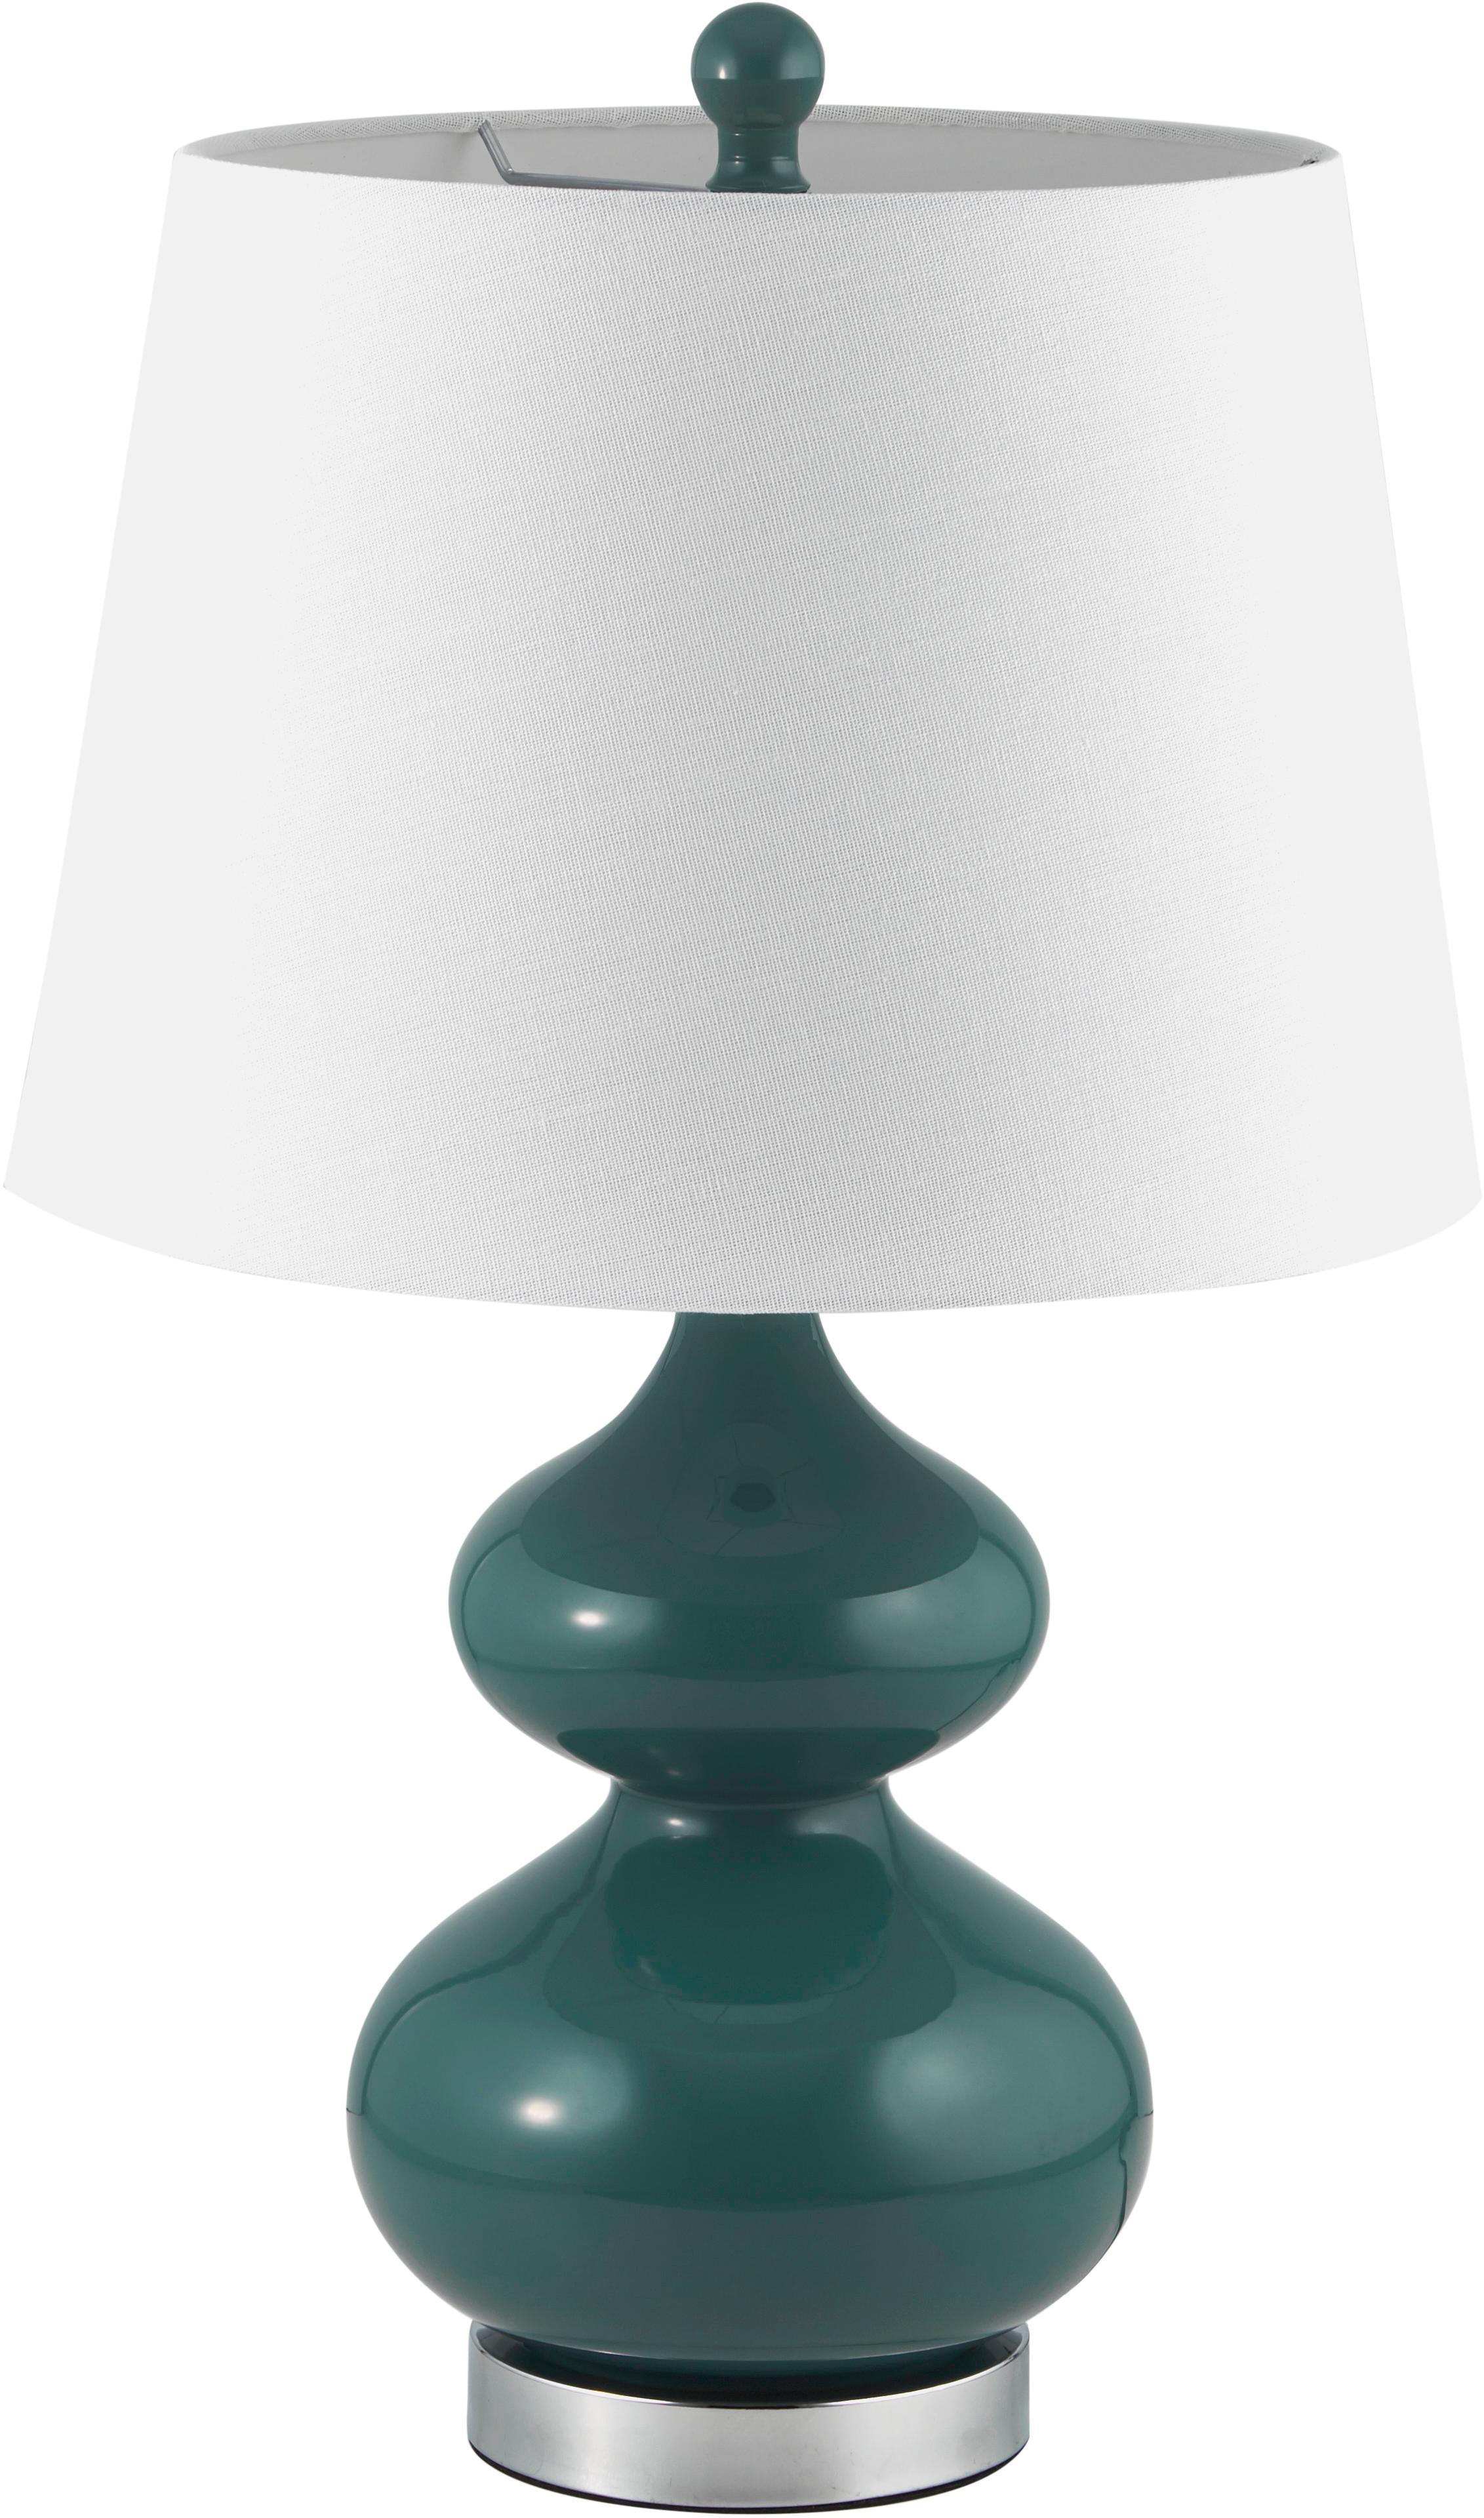 Grote tafellampen Felicitas, 2 stuks, Lampenkap: katoen, Lampvoet: metaal, gelakt glas, Groen, Ø 35 x H 58 cm